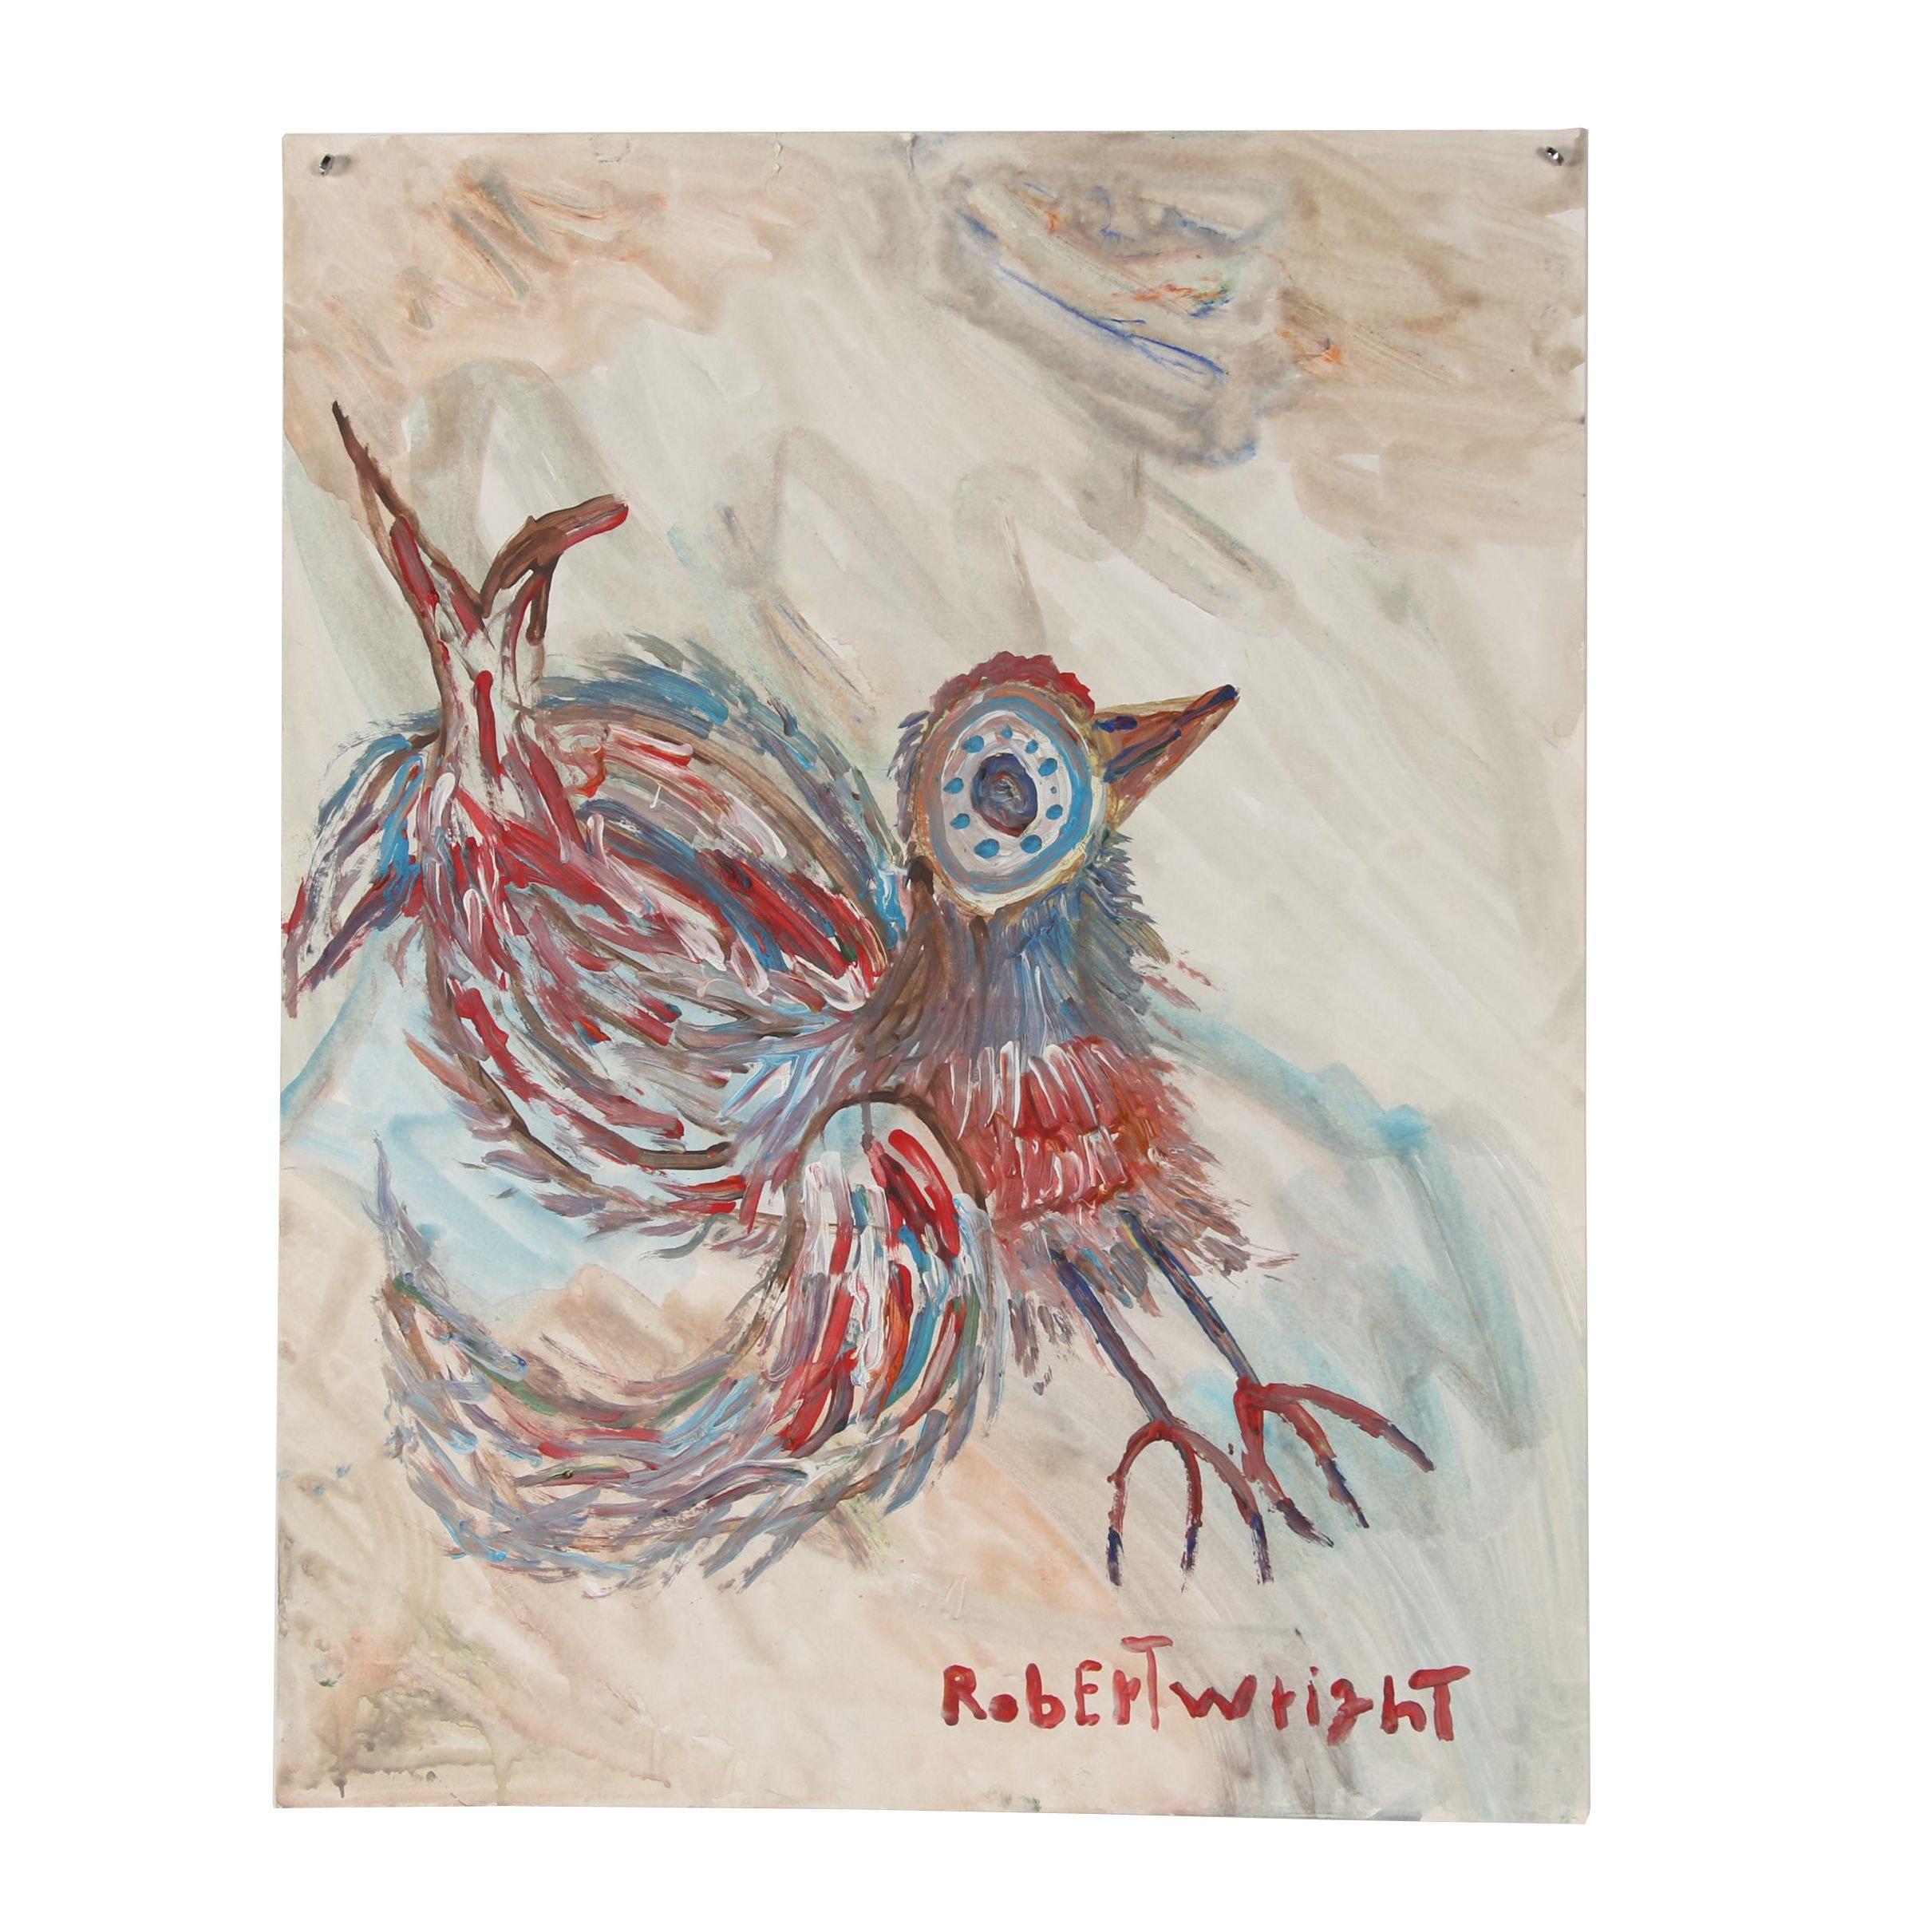 Robert Wright Acrylic Painting